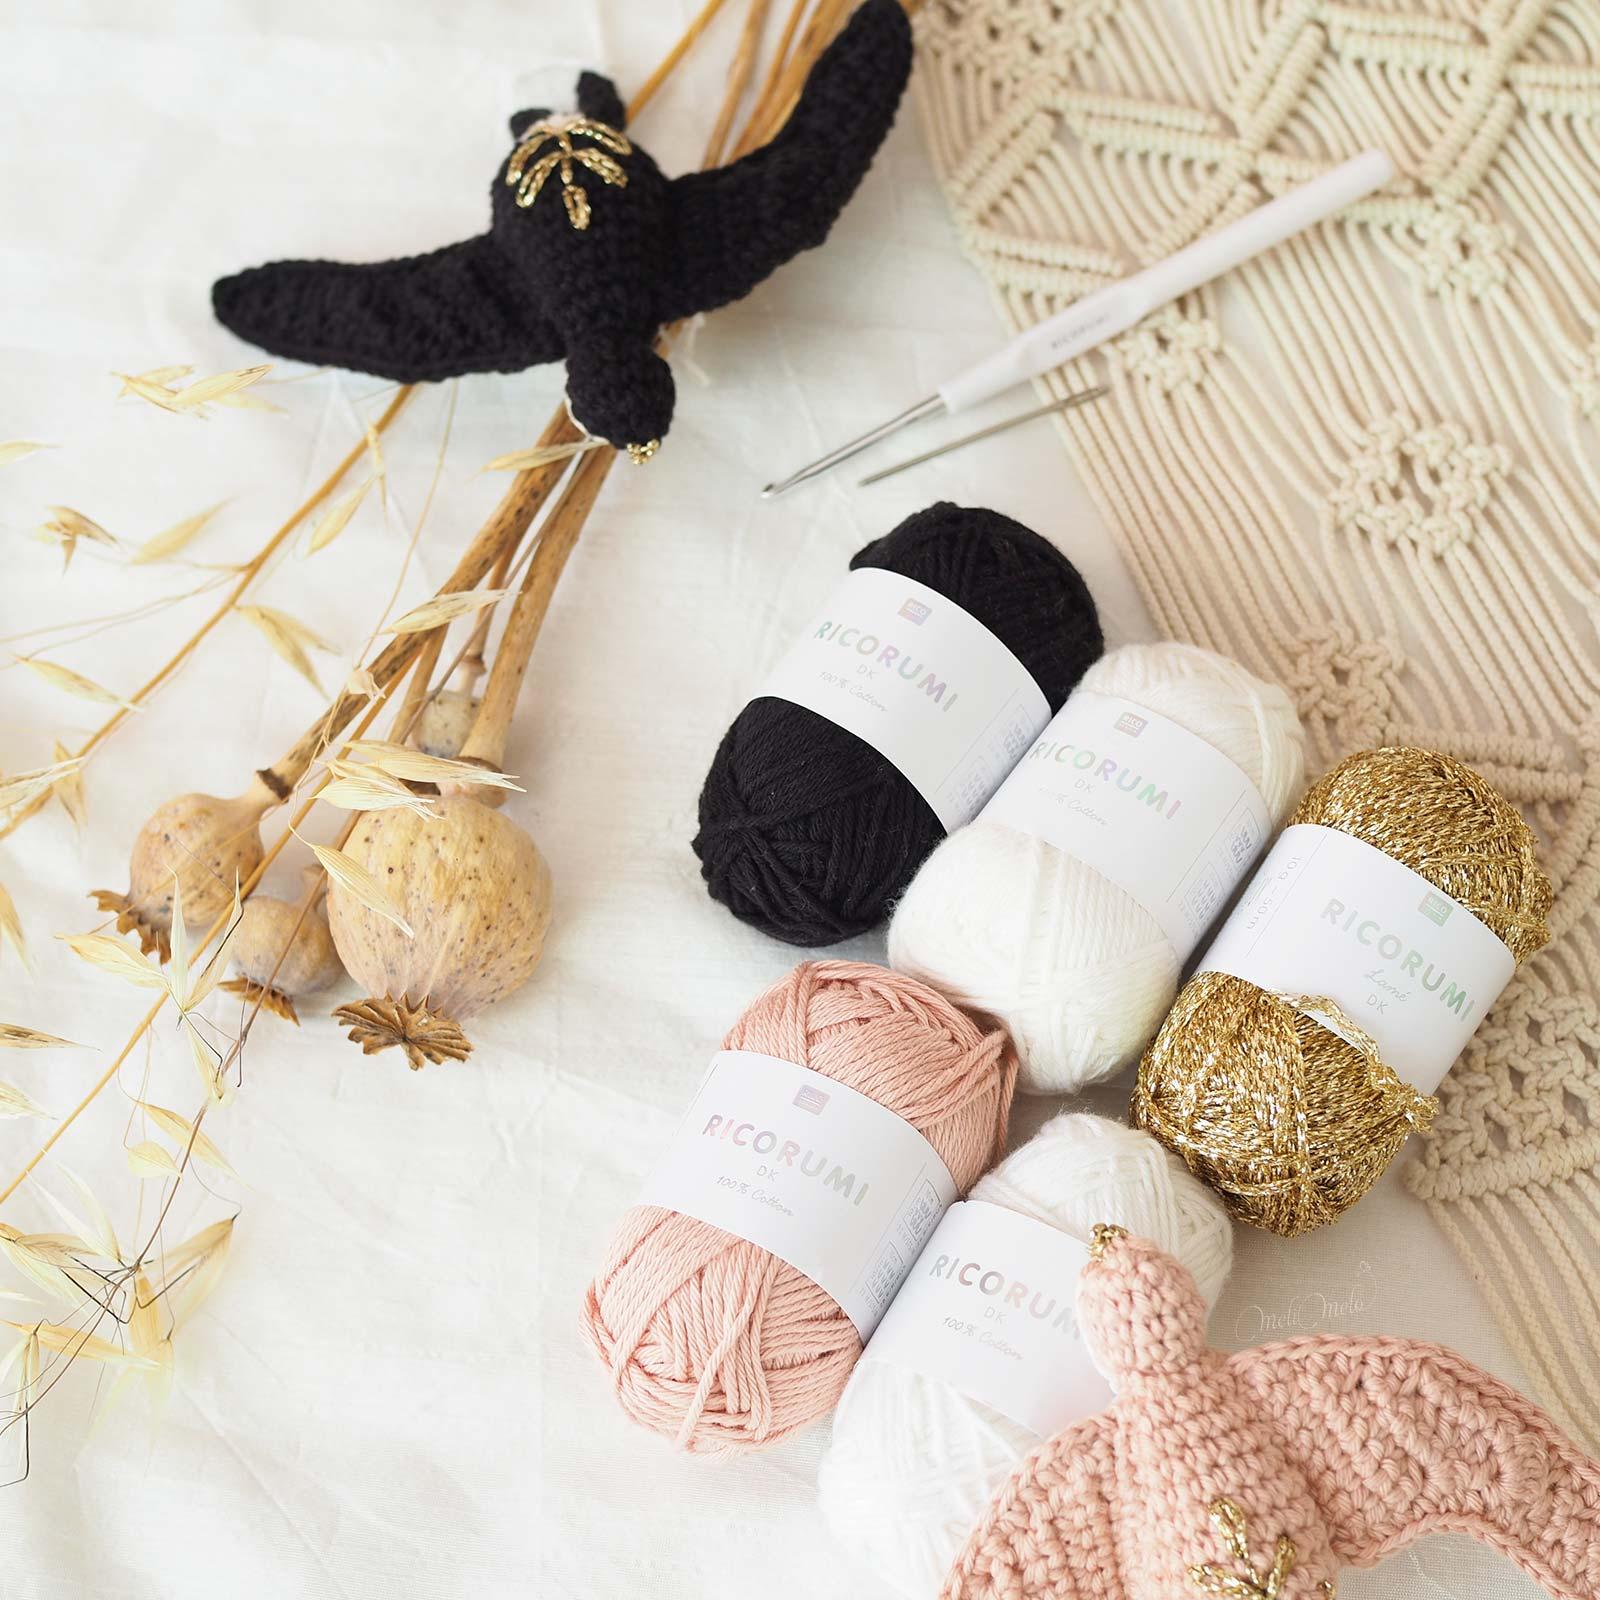 ricorumi-cotton-swallow-crochet-hirondelle-golondina-diymelimelo-laboutiquedemelimelo